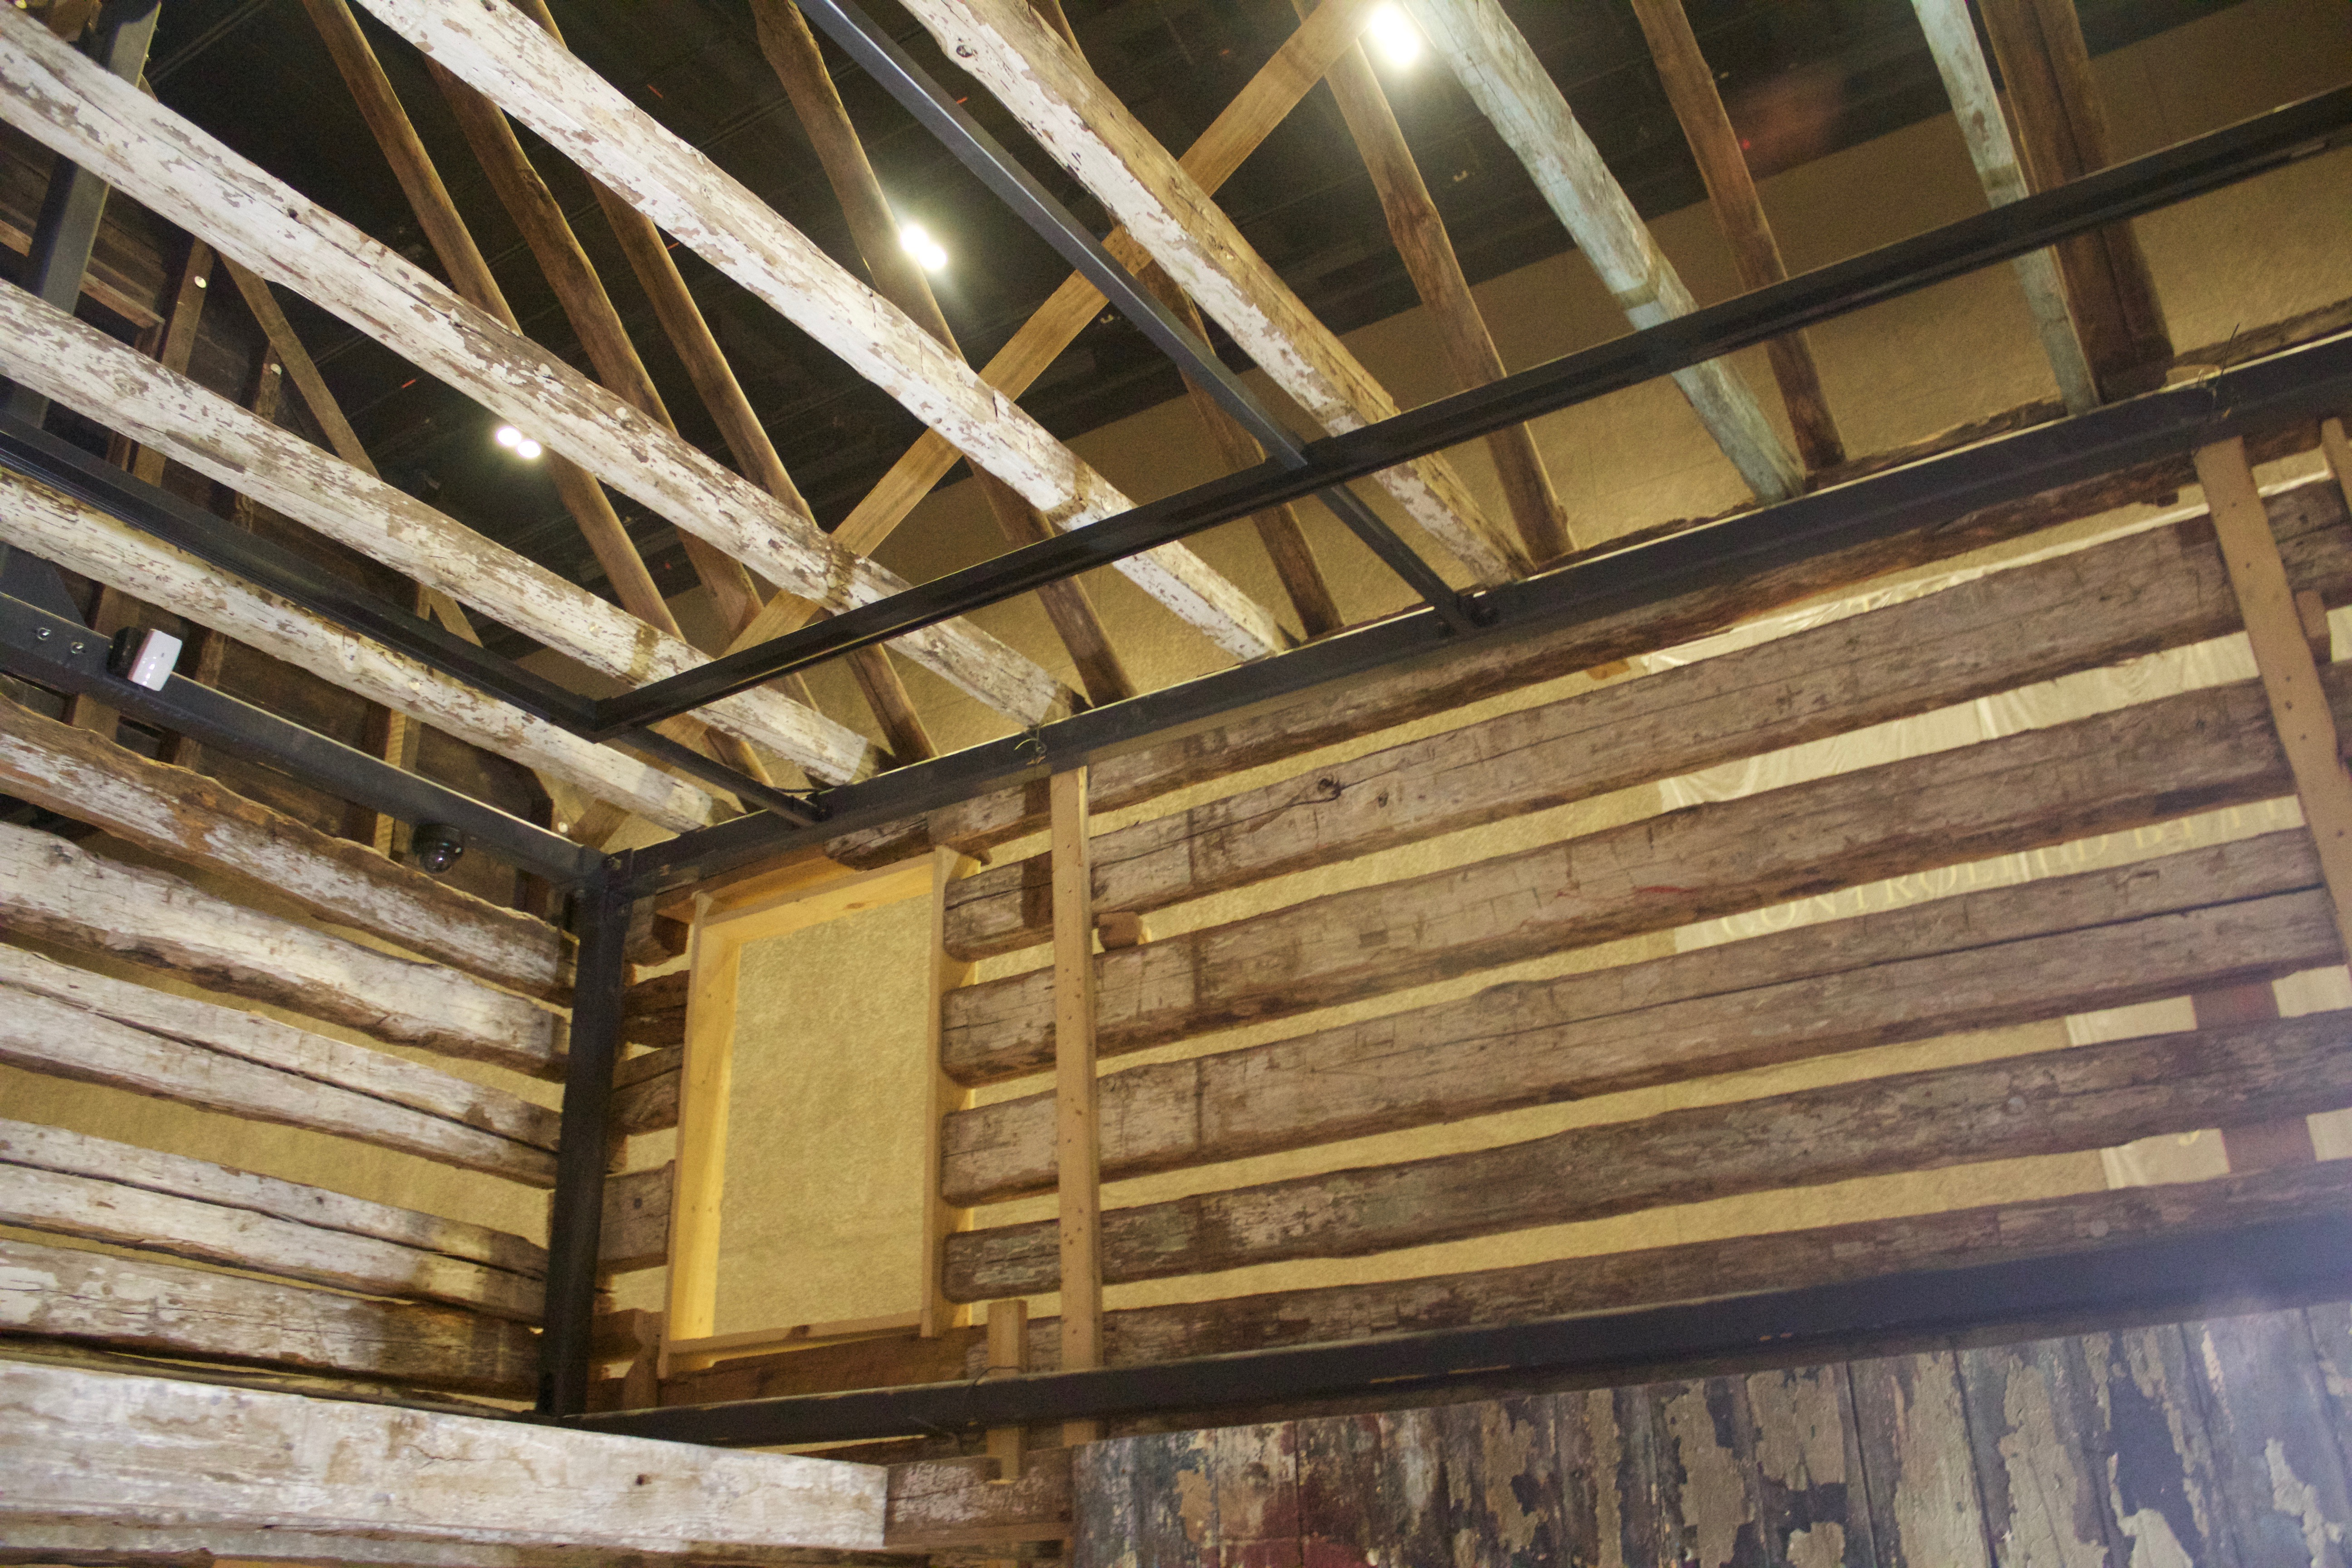 NMAAHC log house interior